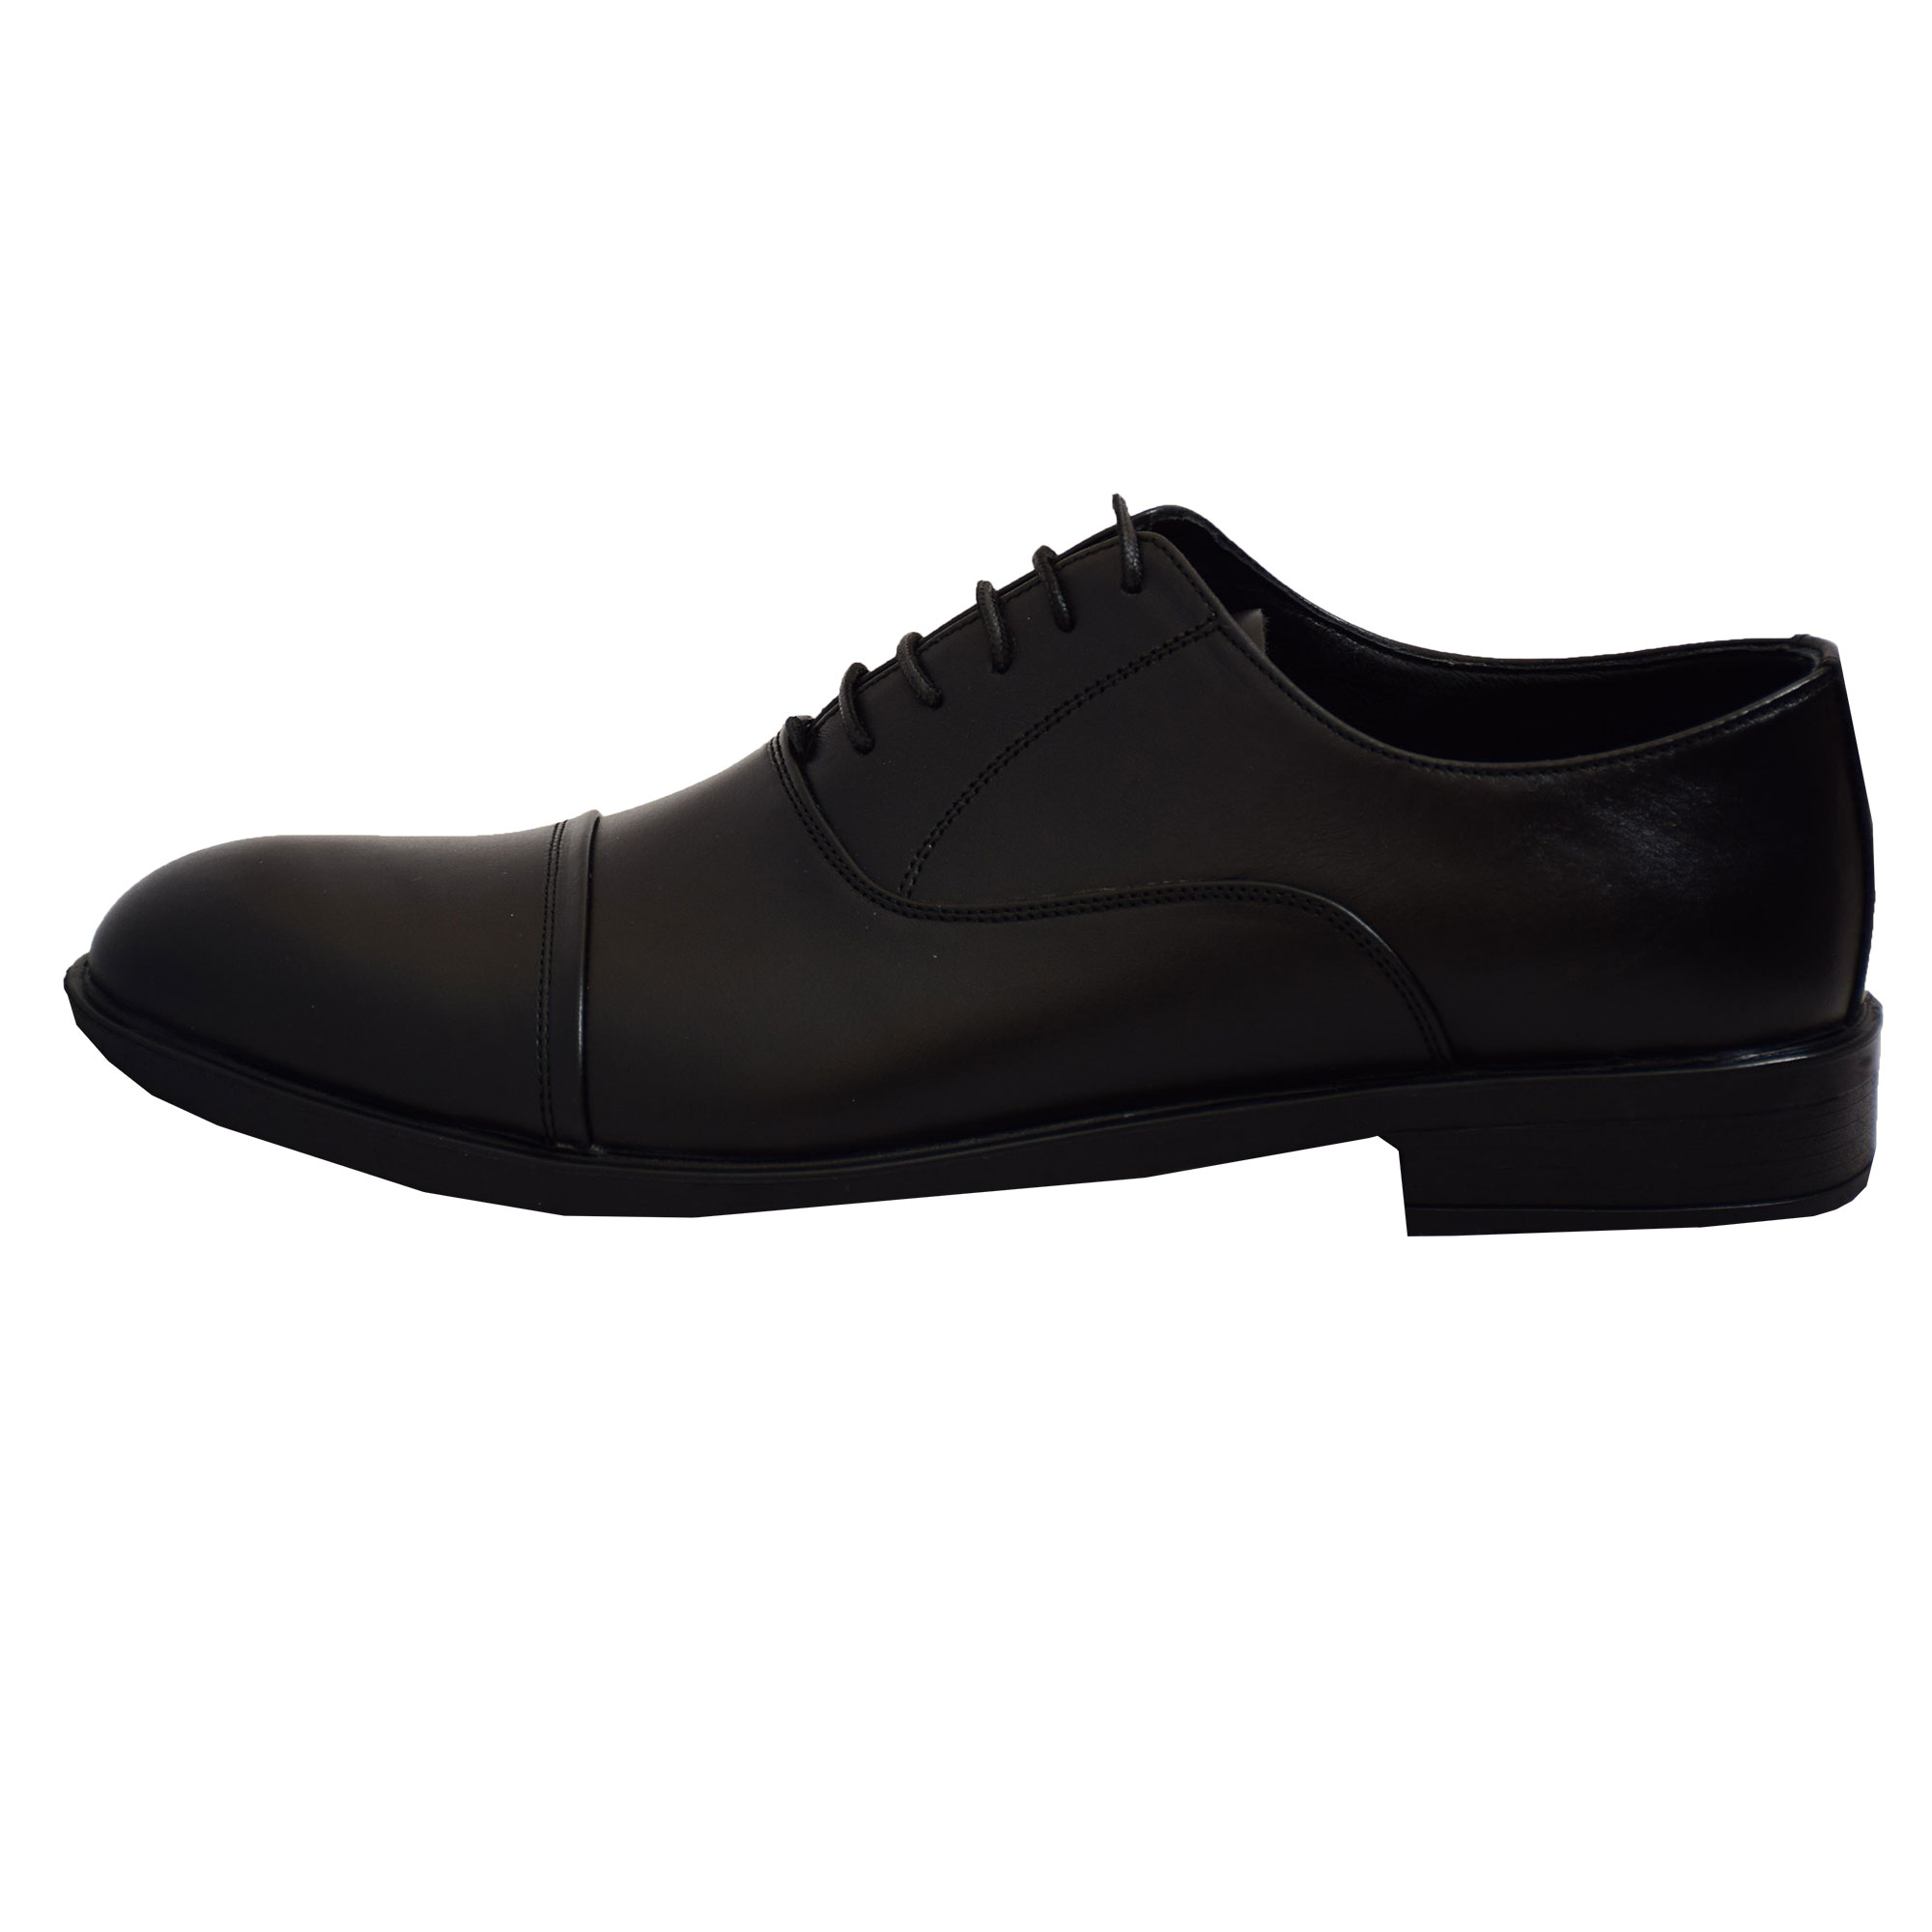 MOGHANLEATHER men's shoes, 1509 Model